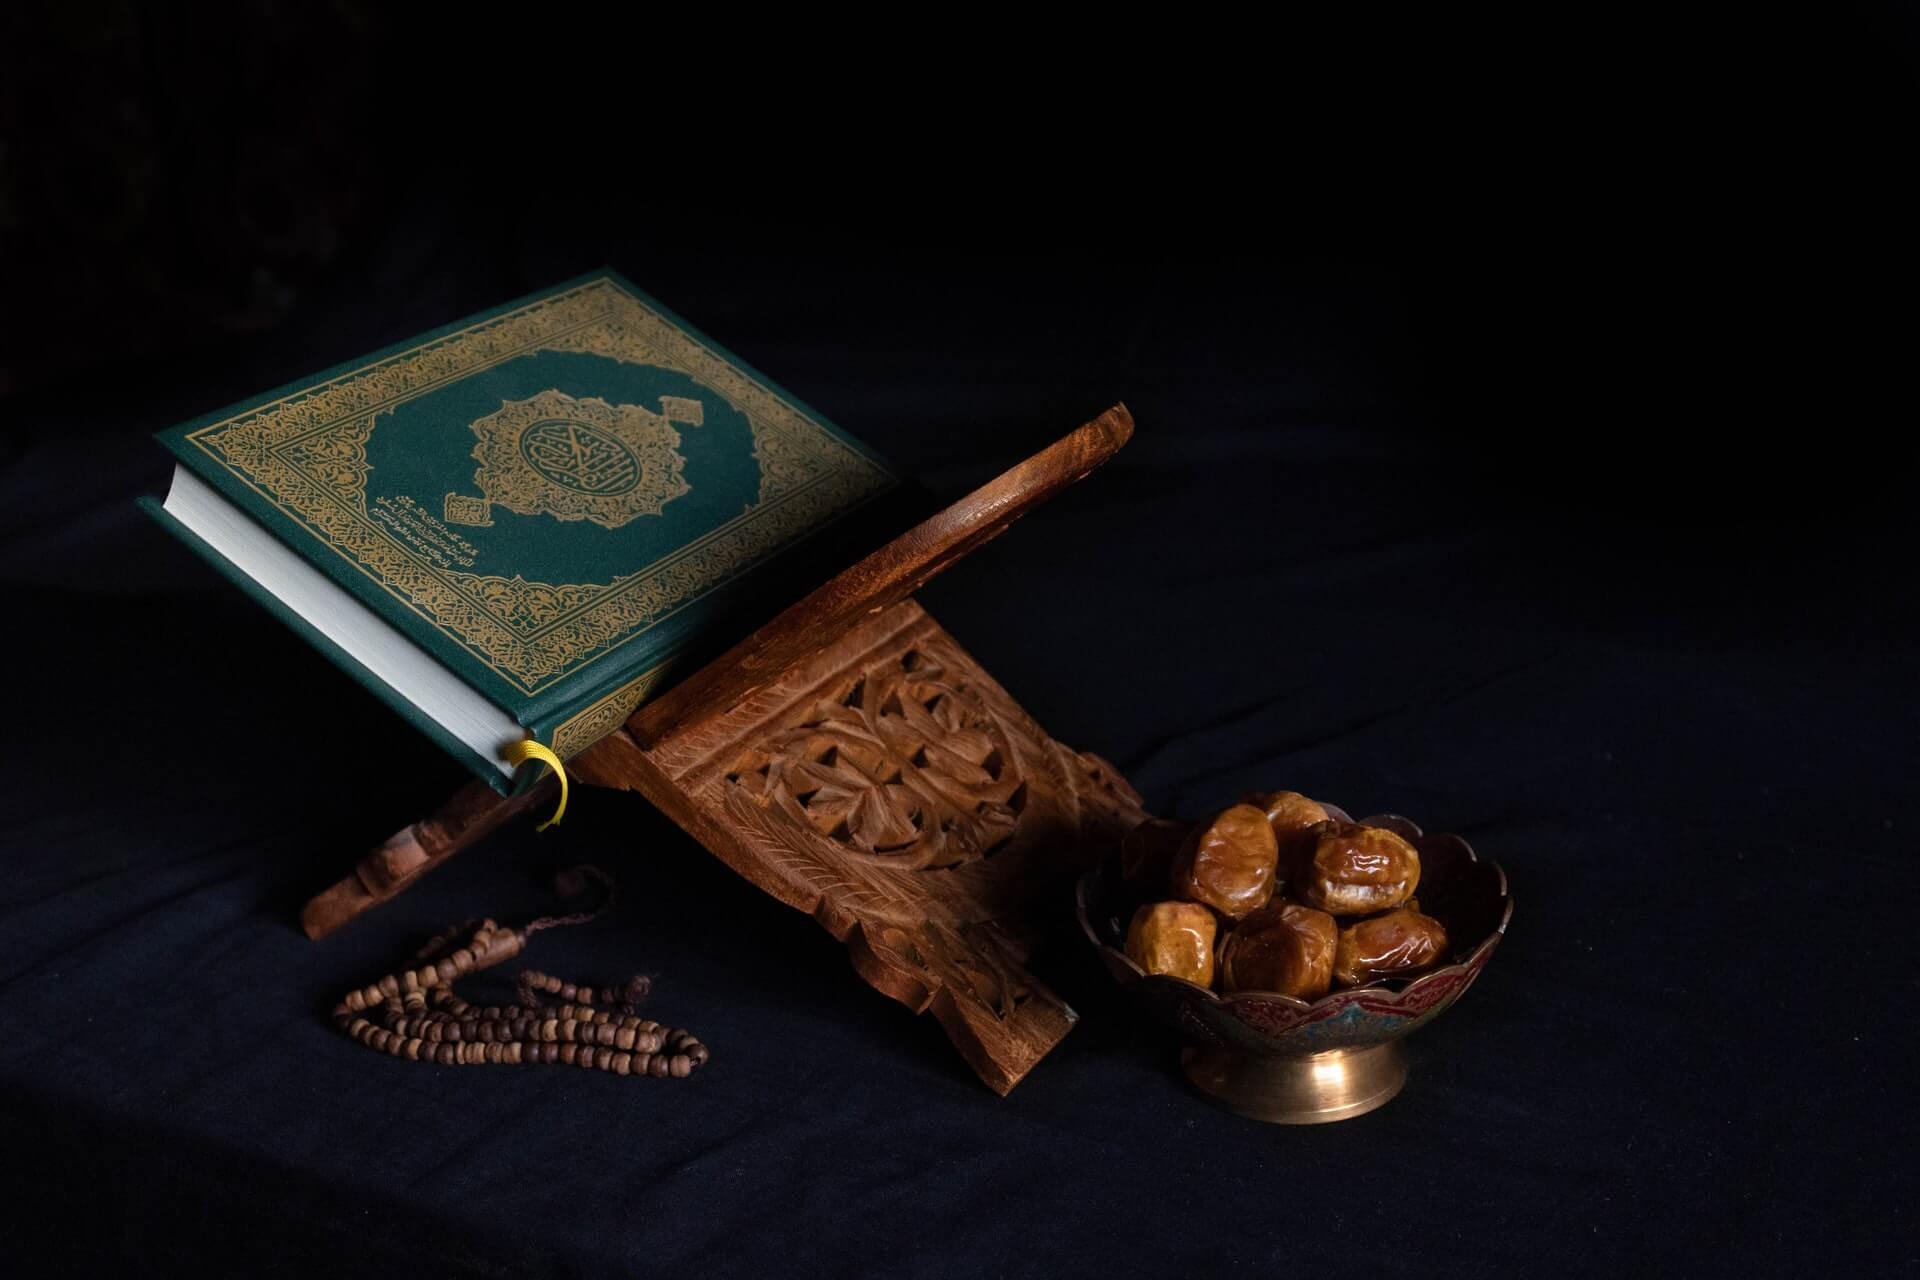 Hubungan Ilmu Kalam dengan Filsafat Keislaman